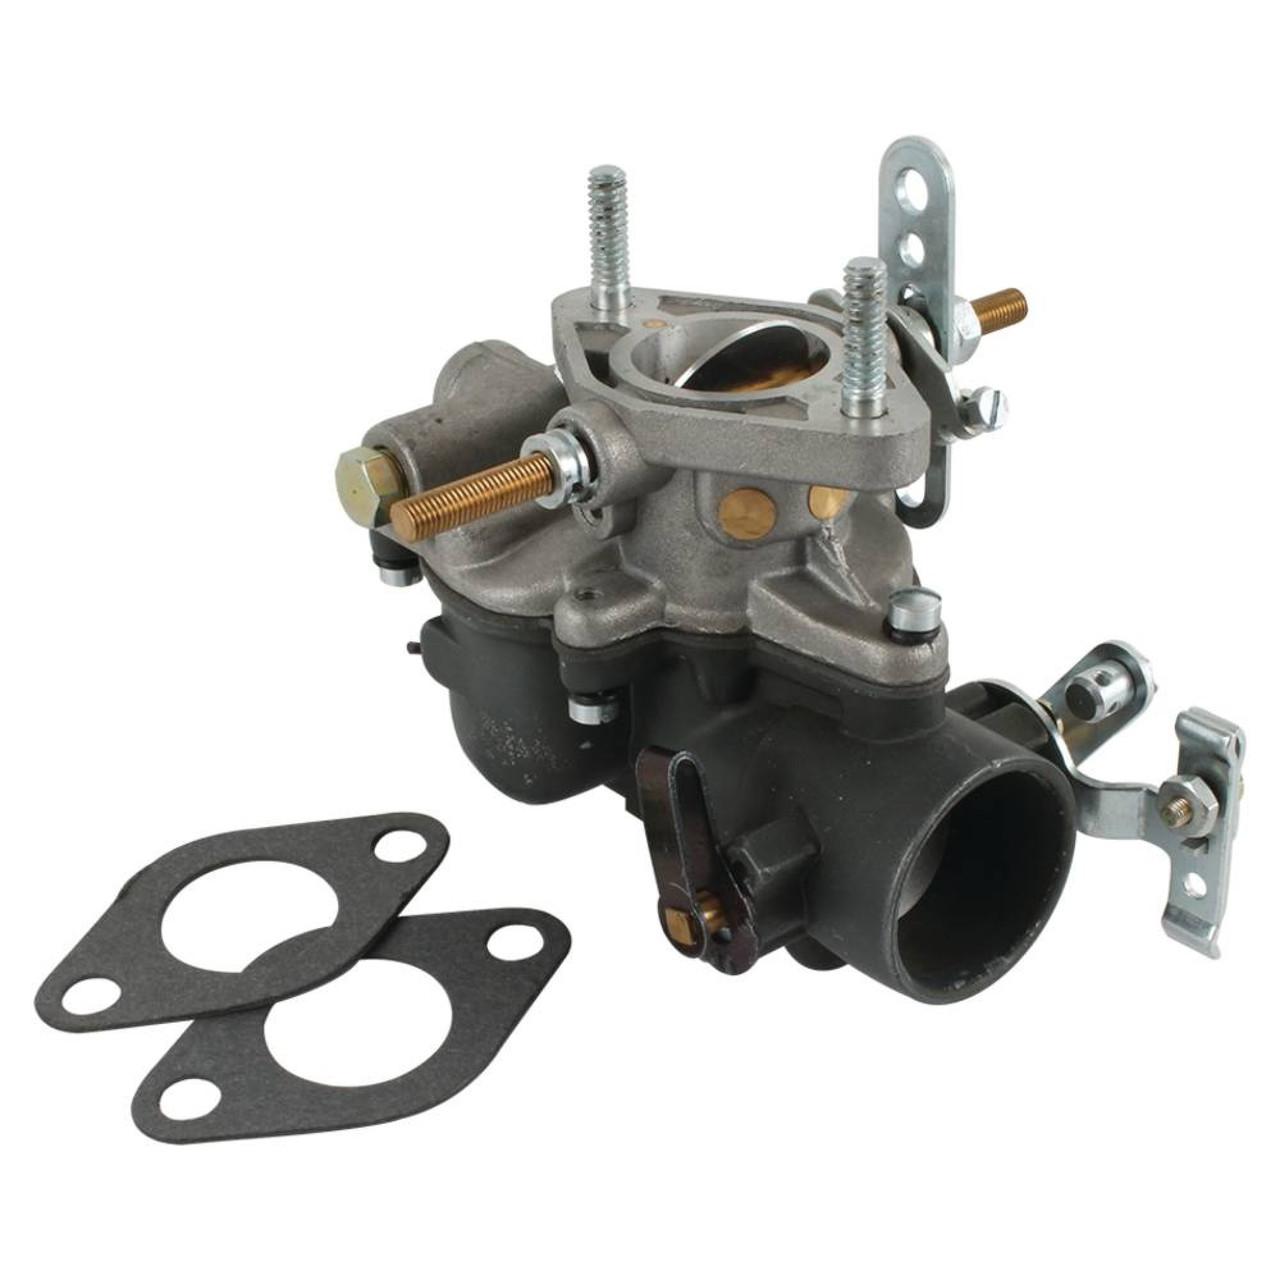 Zenith Style Replacement Carburetor for Massey Ferguson 135